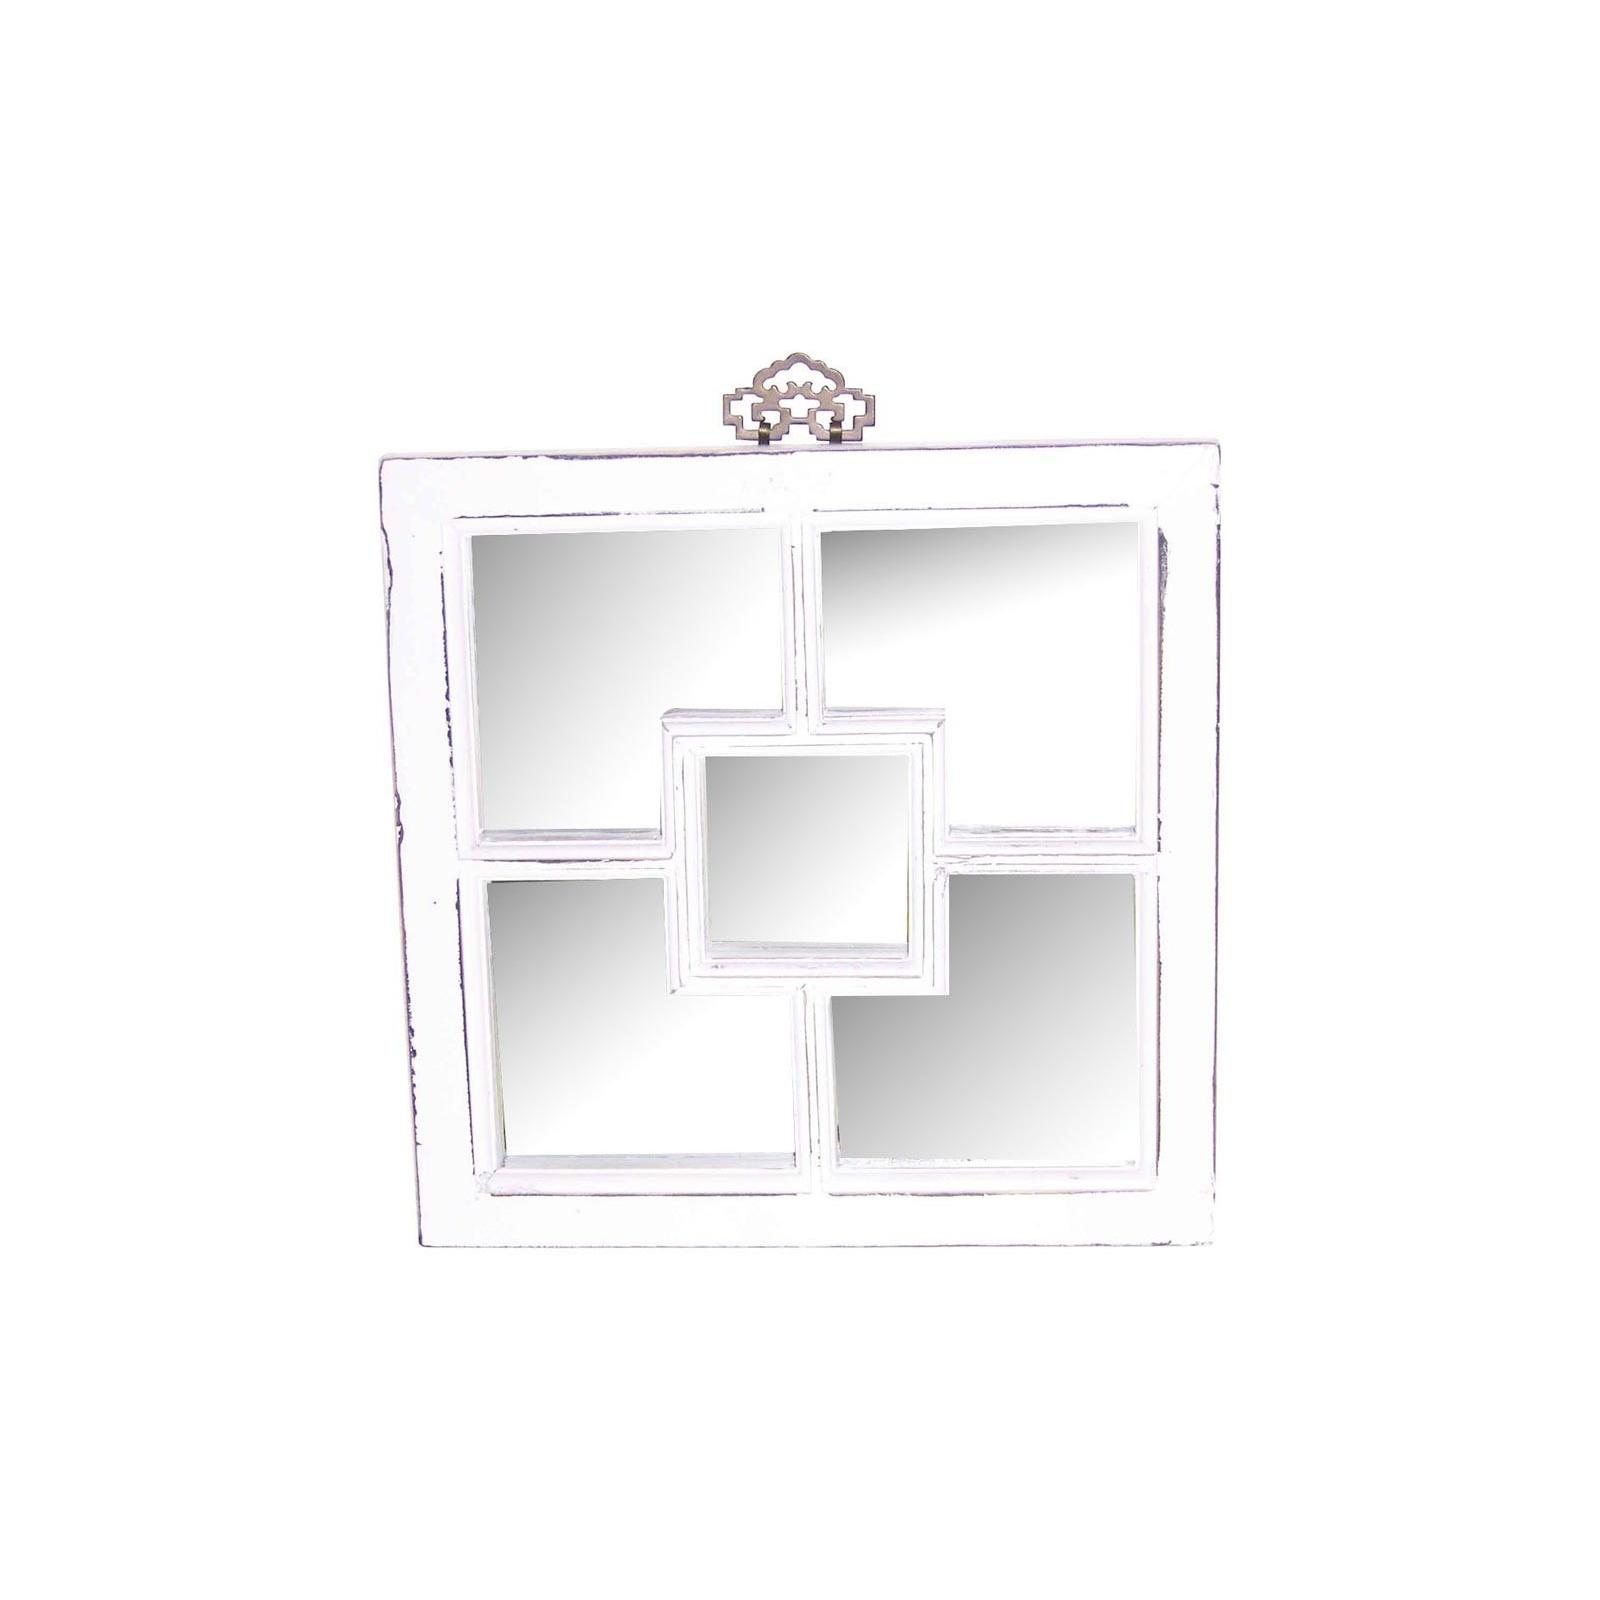 miroir carr jp2b d coration. Black Bedroom Furniture Sets. Home Design Ideas